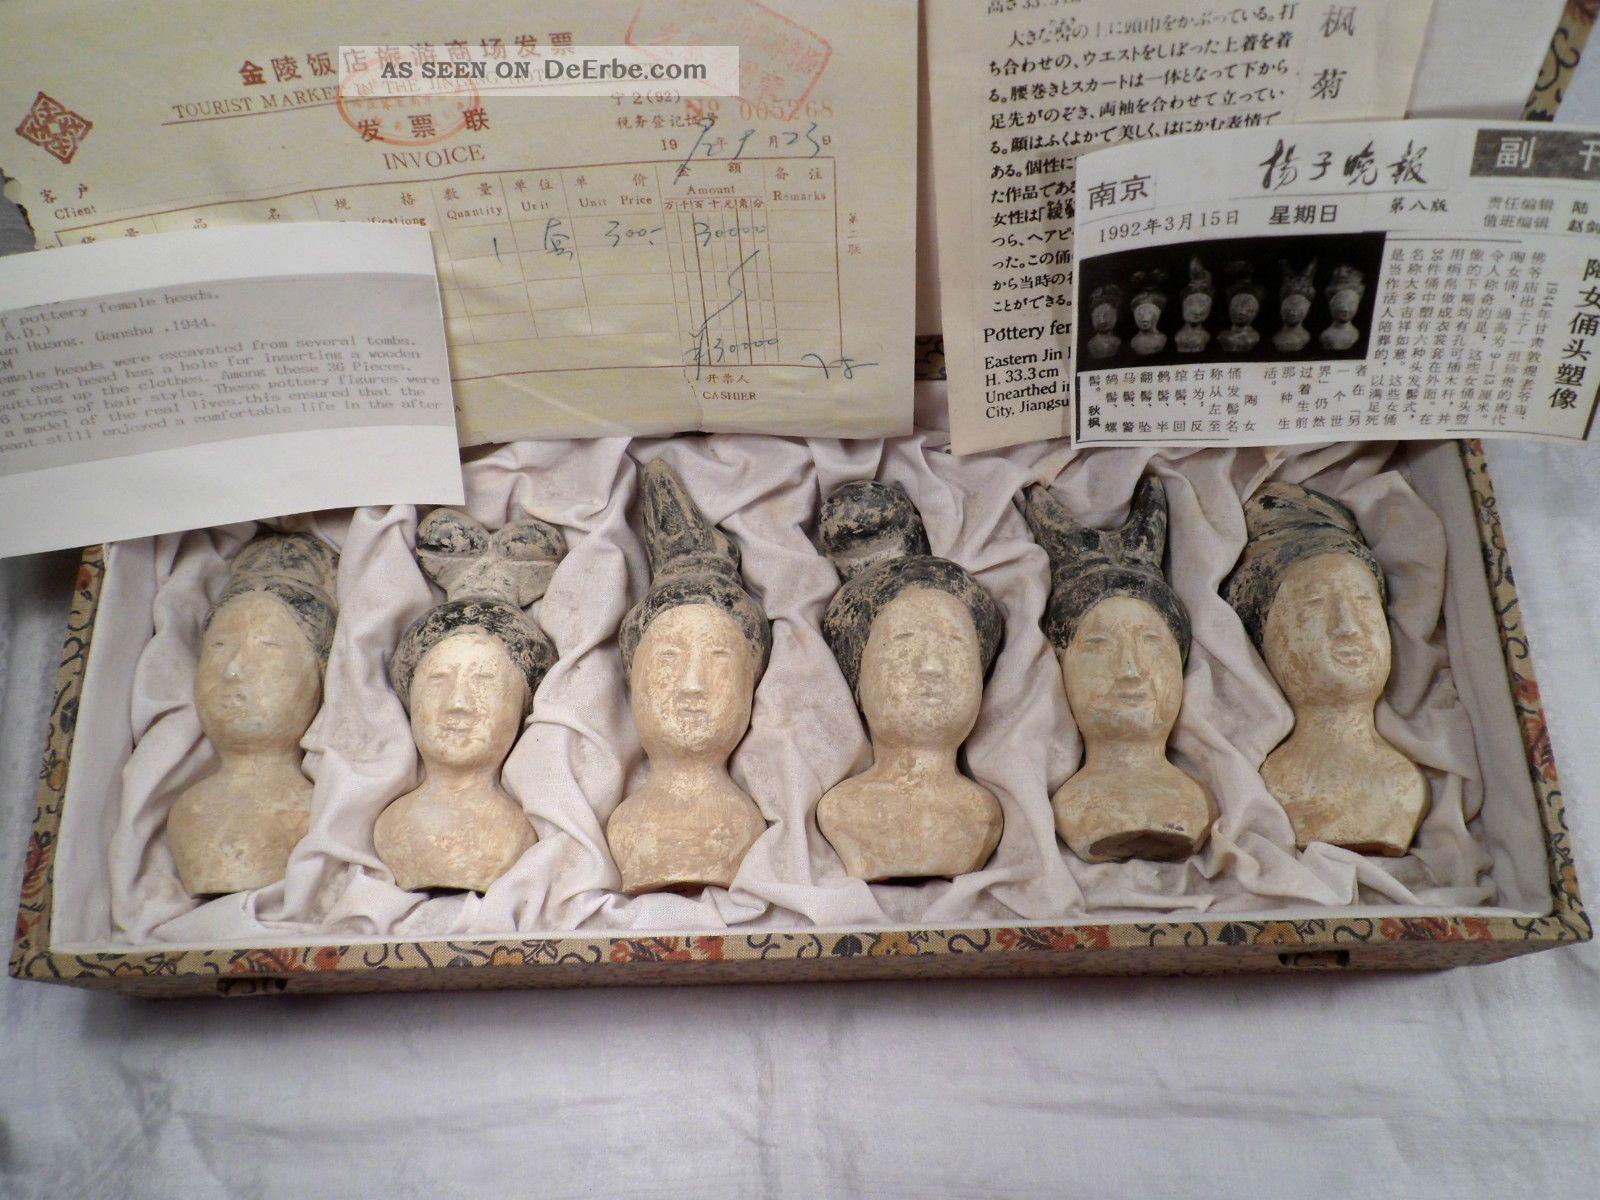 Nachbildung 6 Skulpturen Köpfe Frauen Keramik Tang Dynastie 618 - 907 A.  D.  9 - 13cm Entstehungszeit nach 1945 Bild